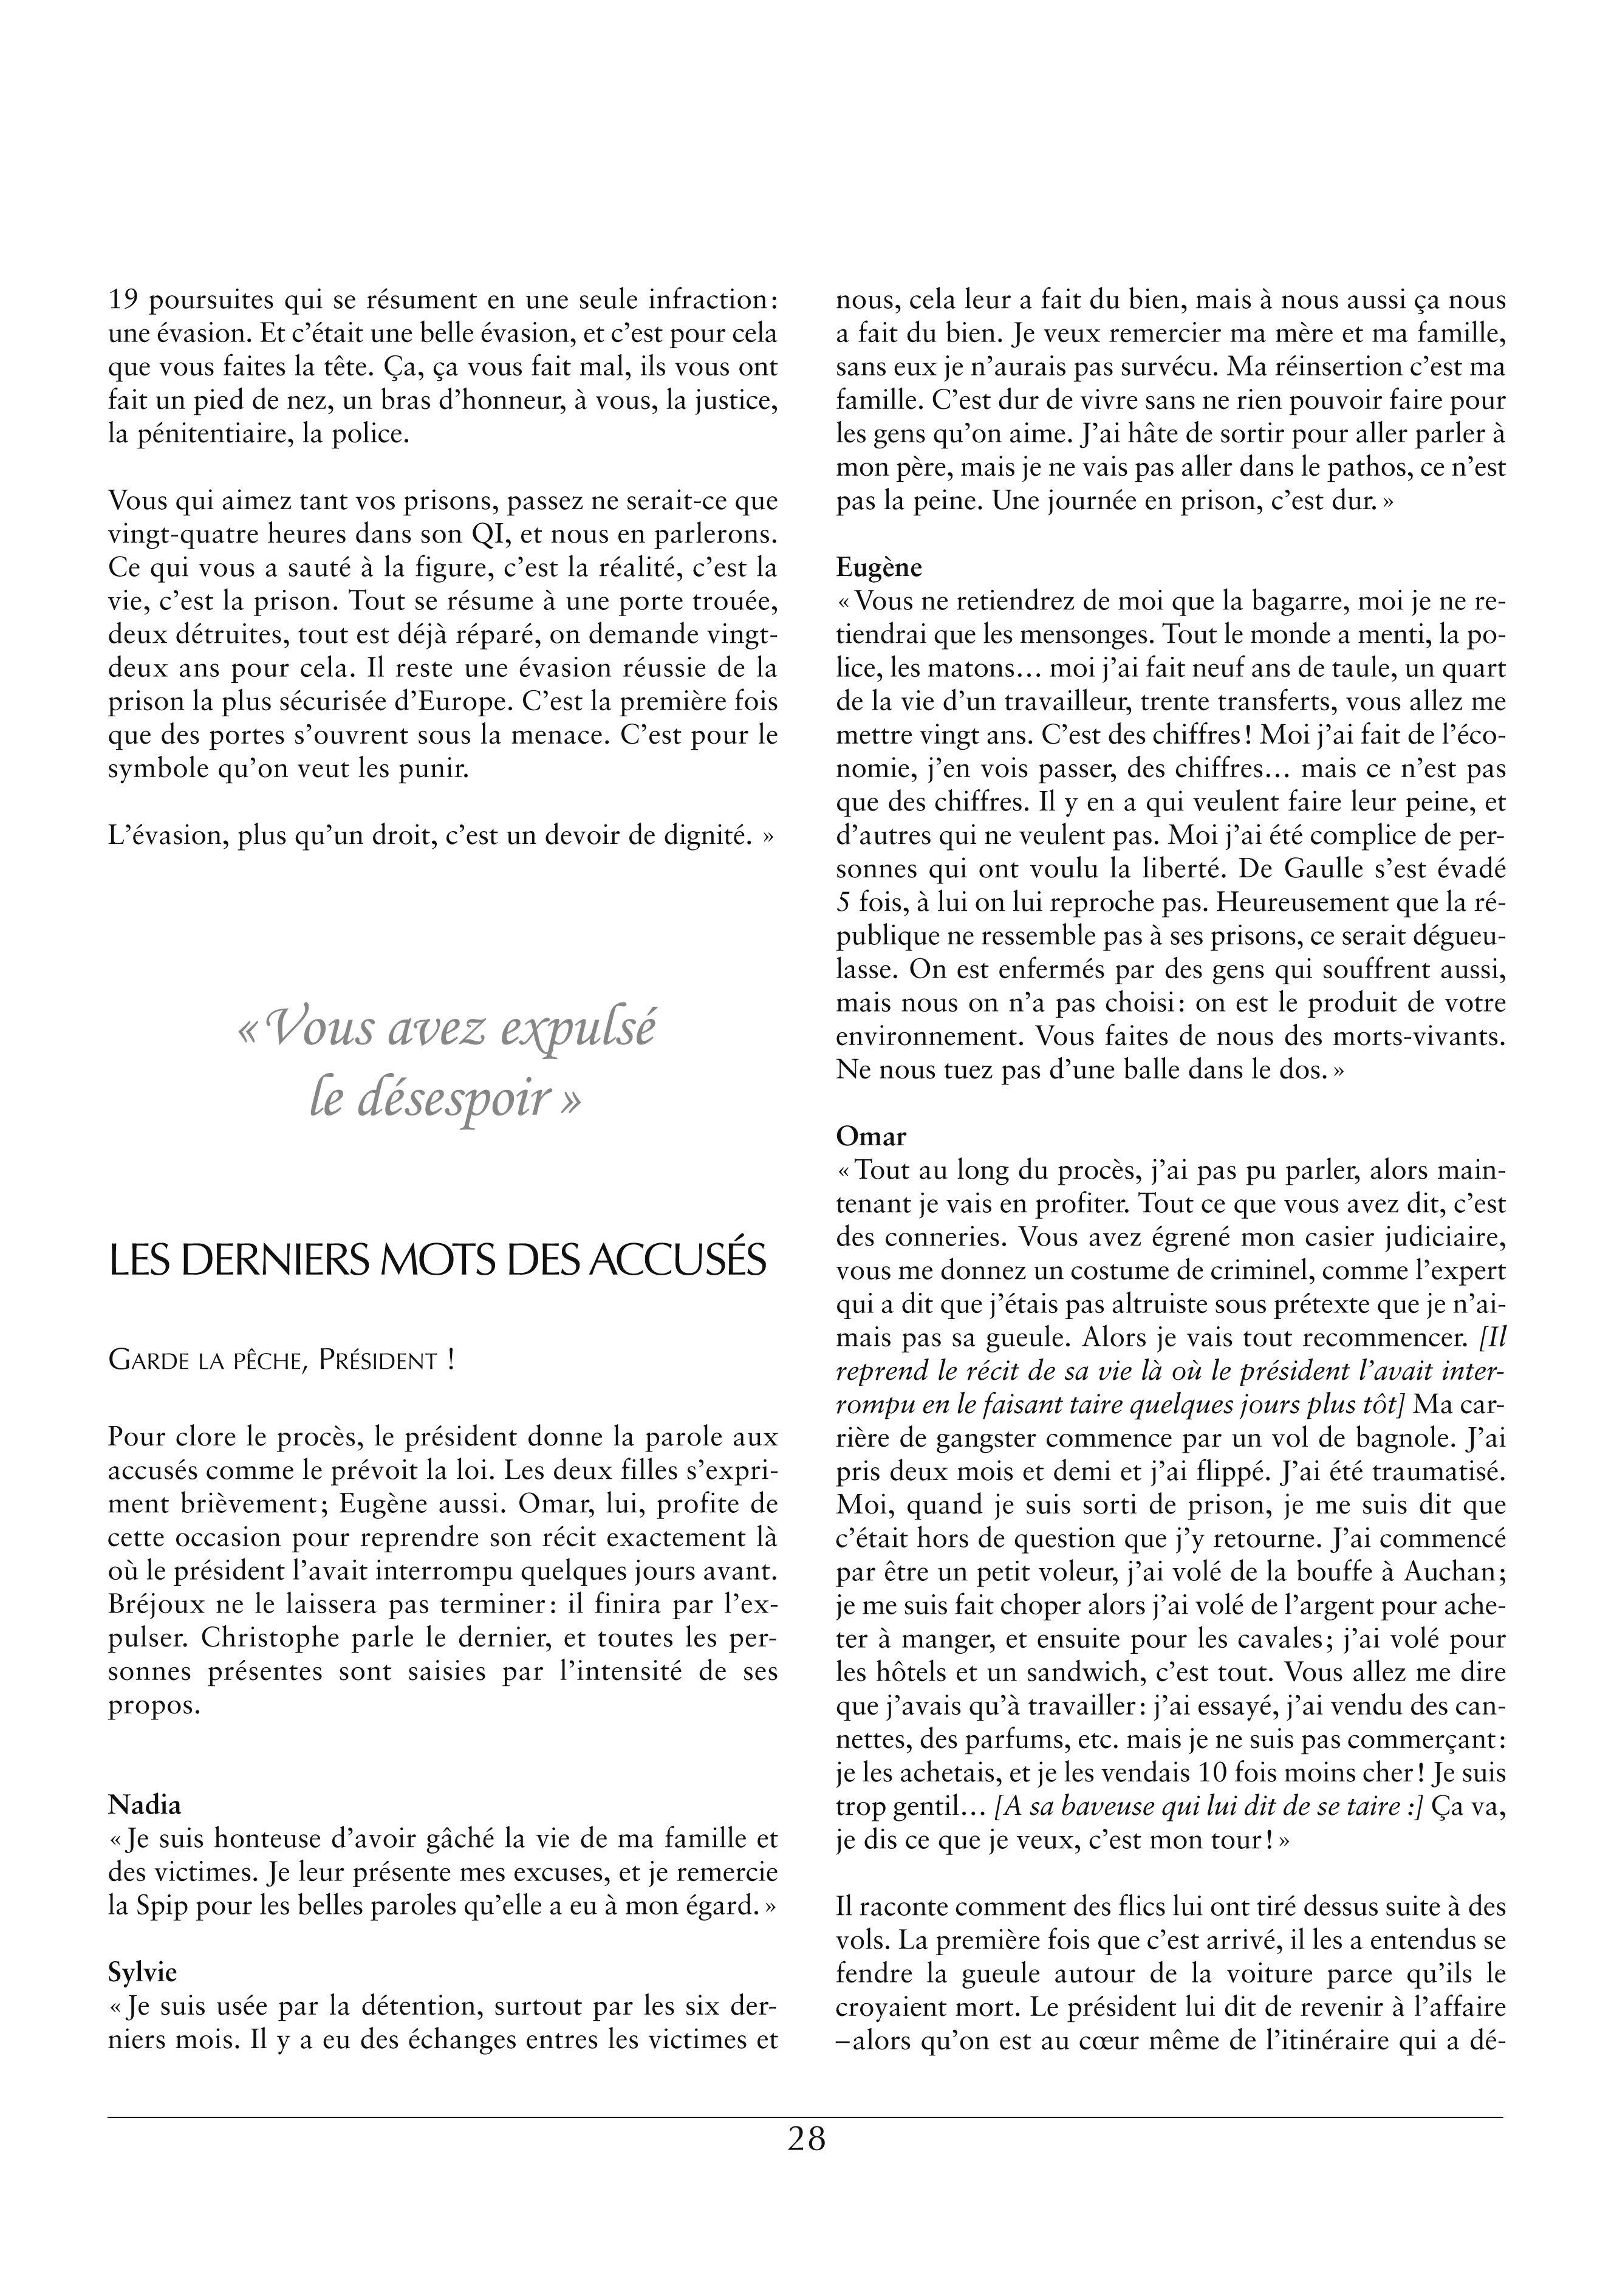 lenvolee_35 1_Page_28